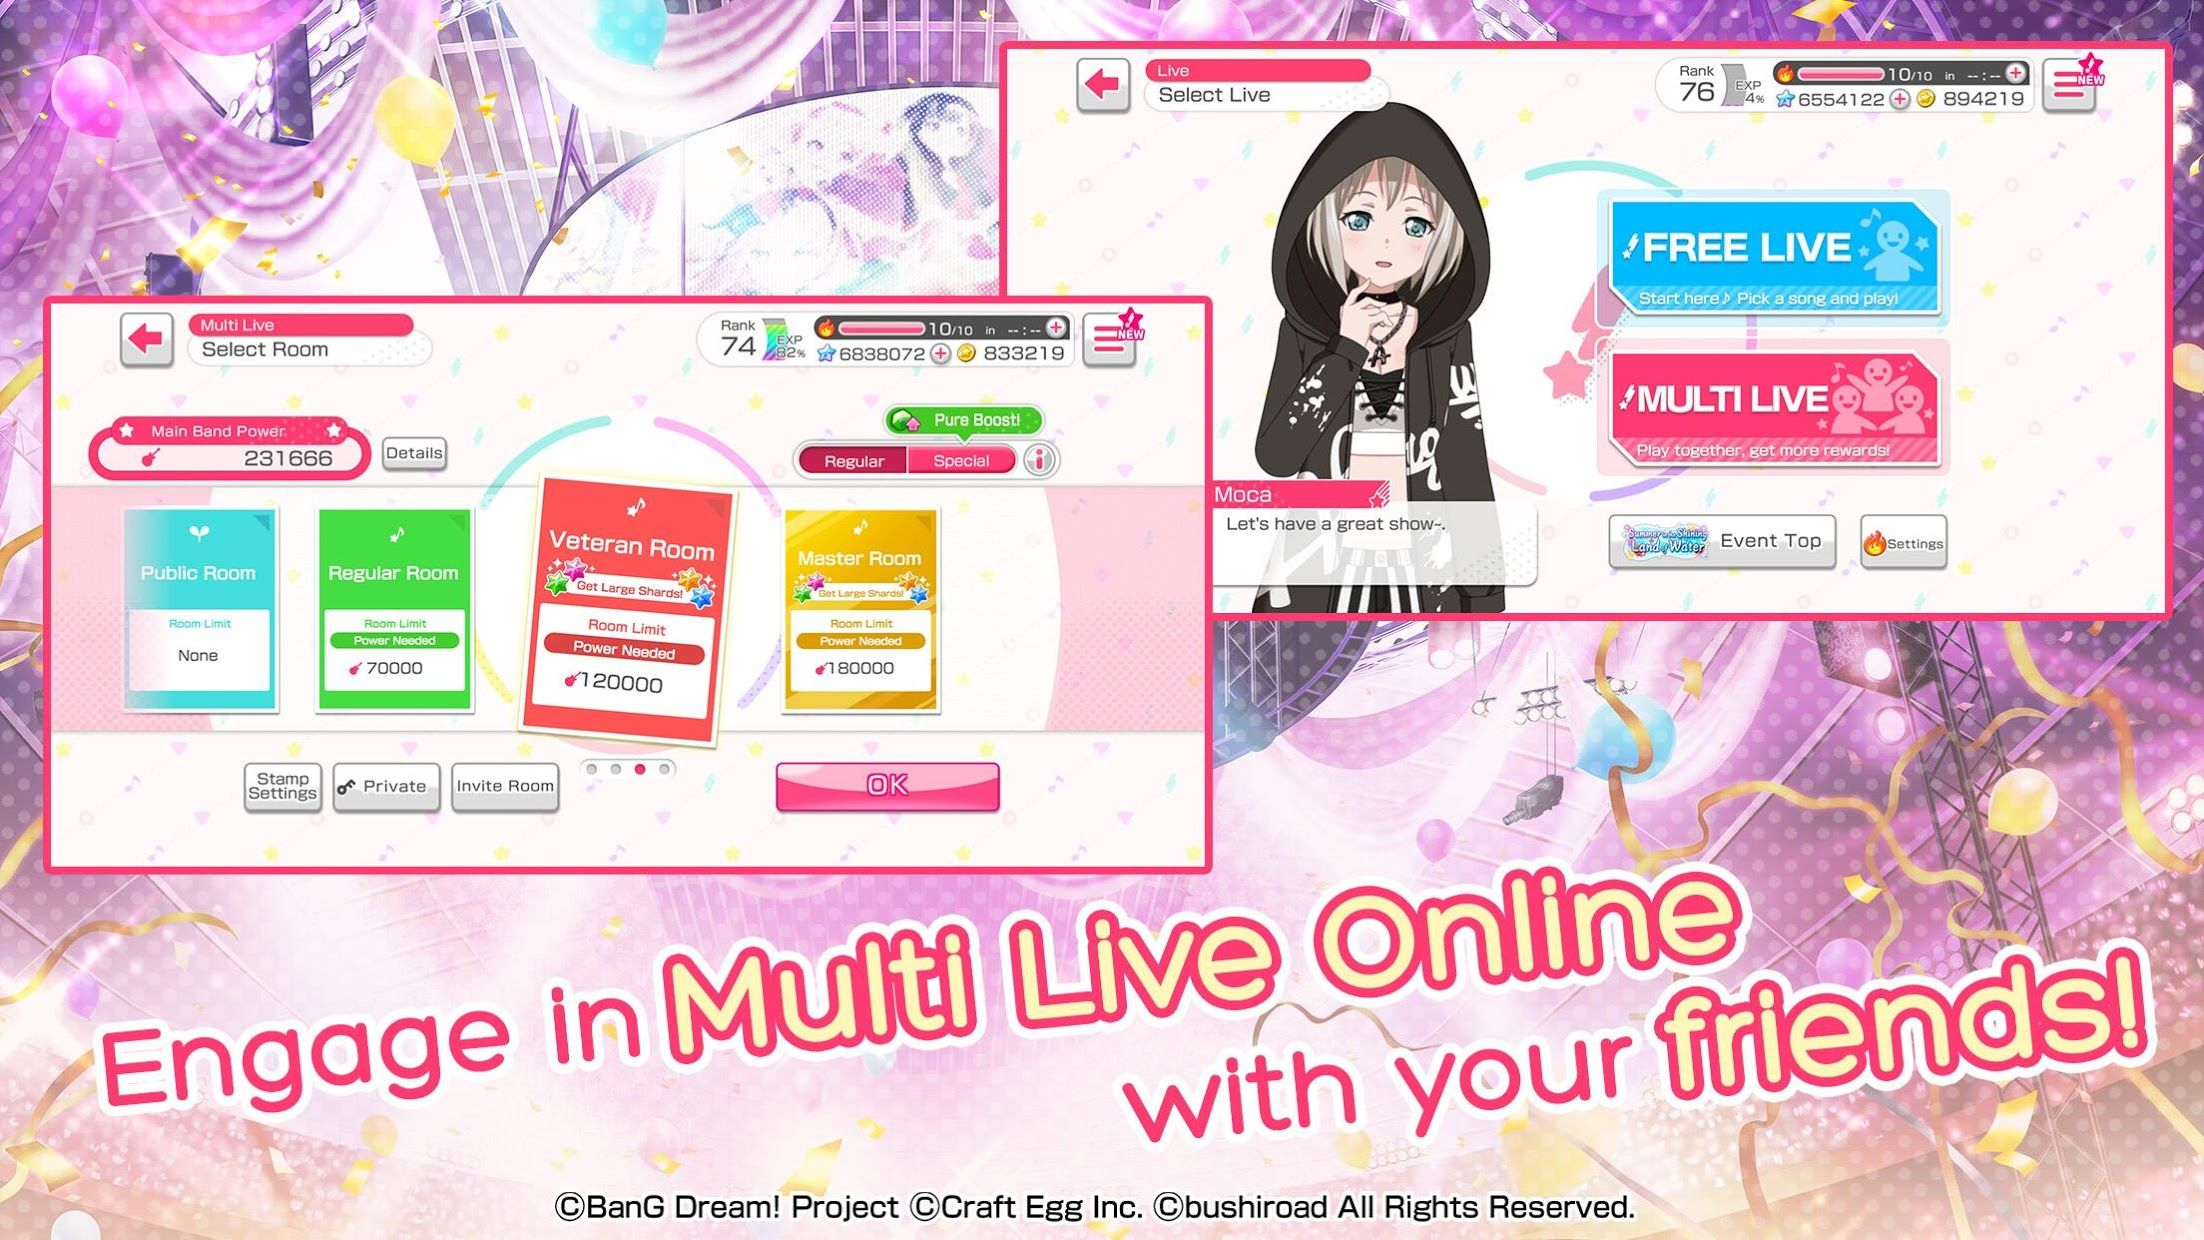 BanG Dream!少女乐团派对!(国际服) 游戏截图4